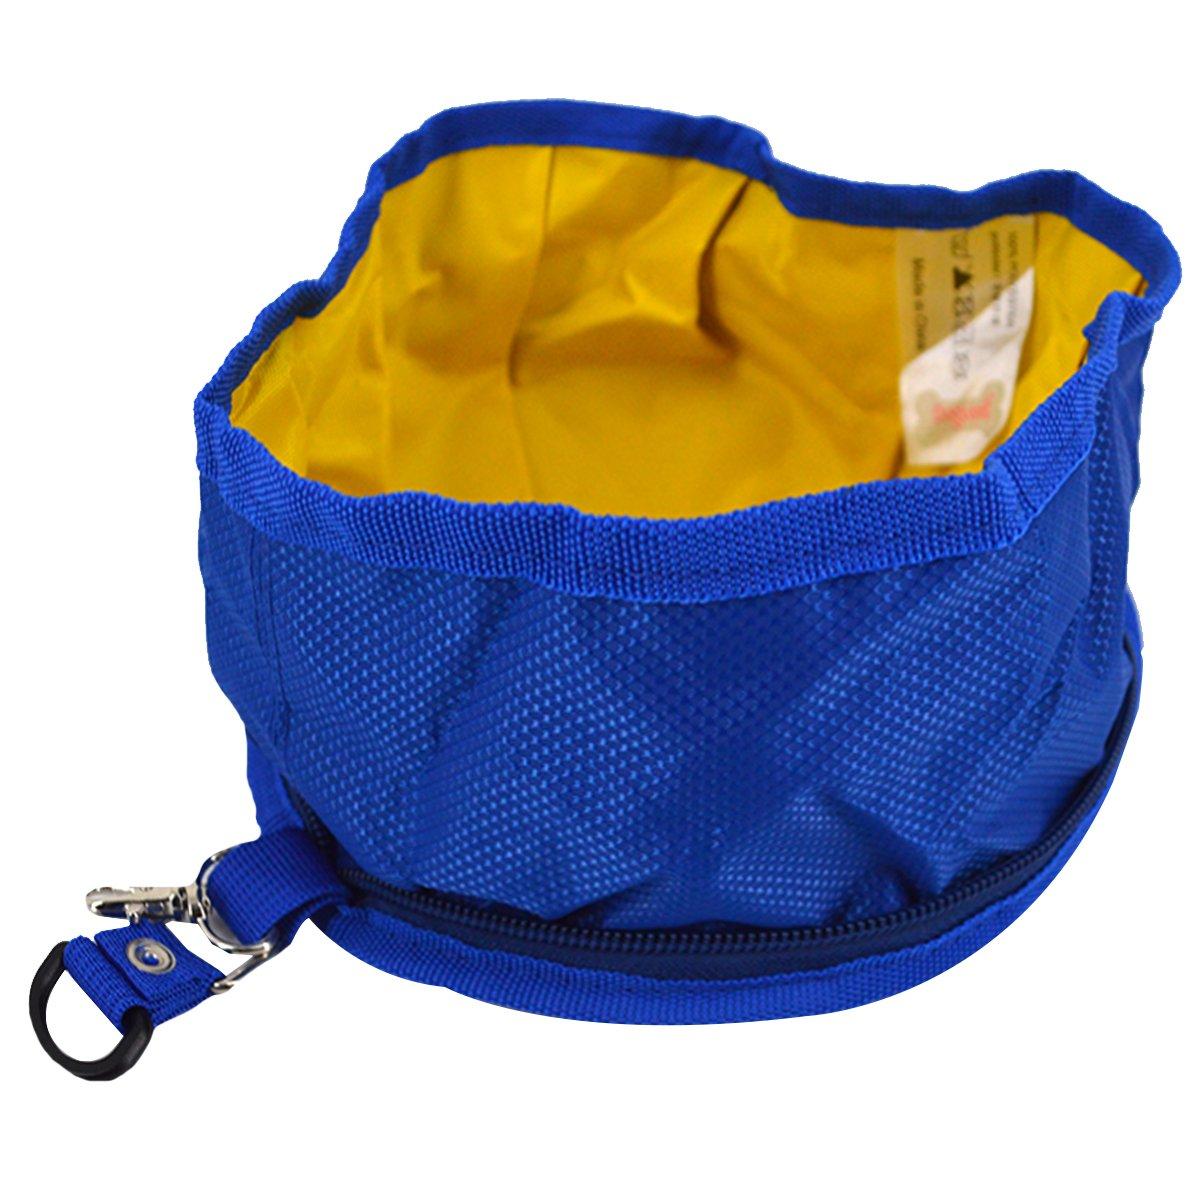 Budd Pet Dog Bowl Folding Doggie Bowl Expandable Travel Food Water Bowl (Navy Blue,S)